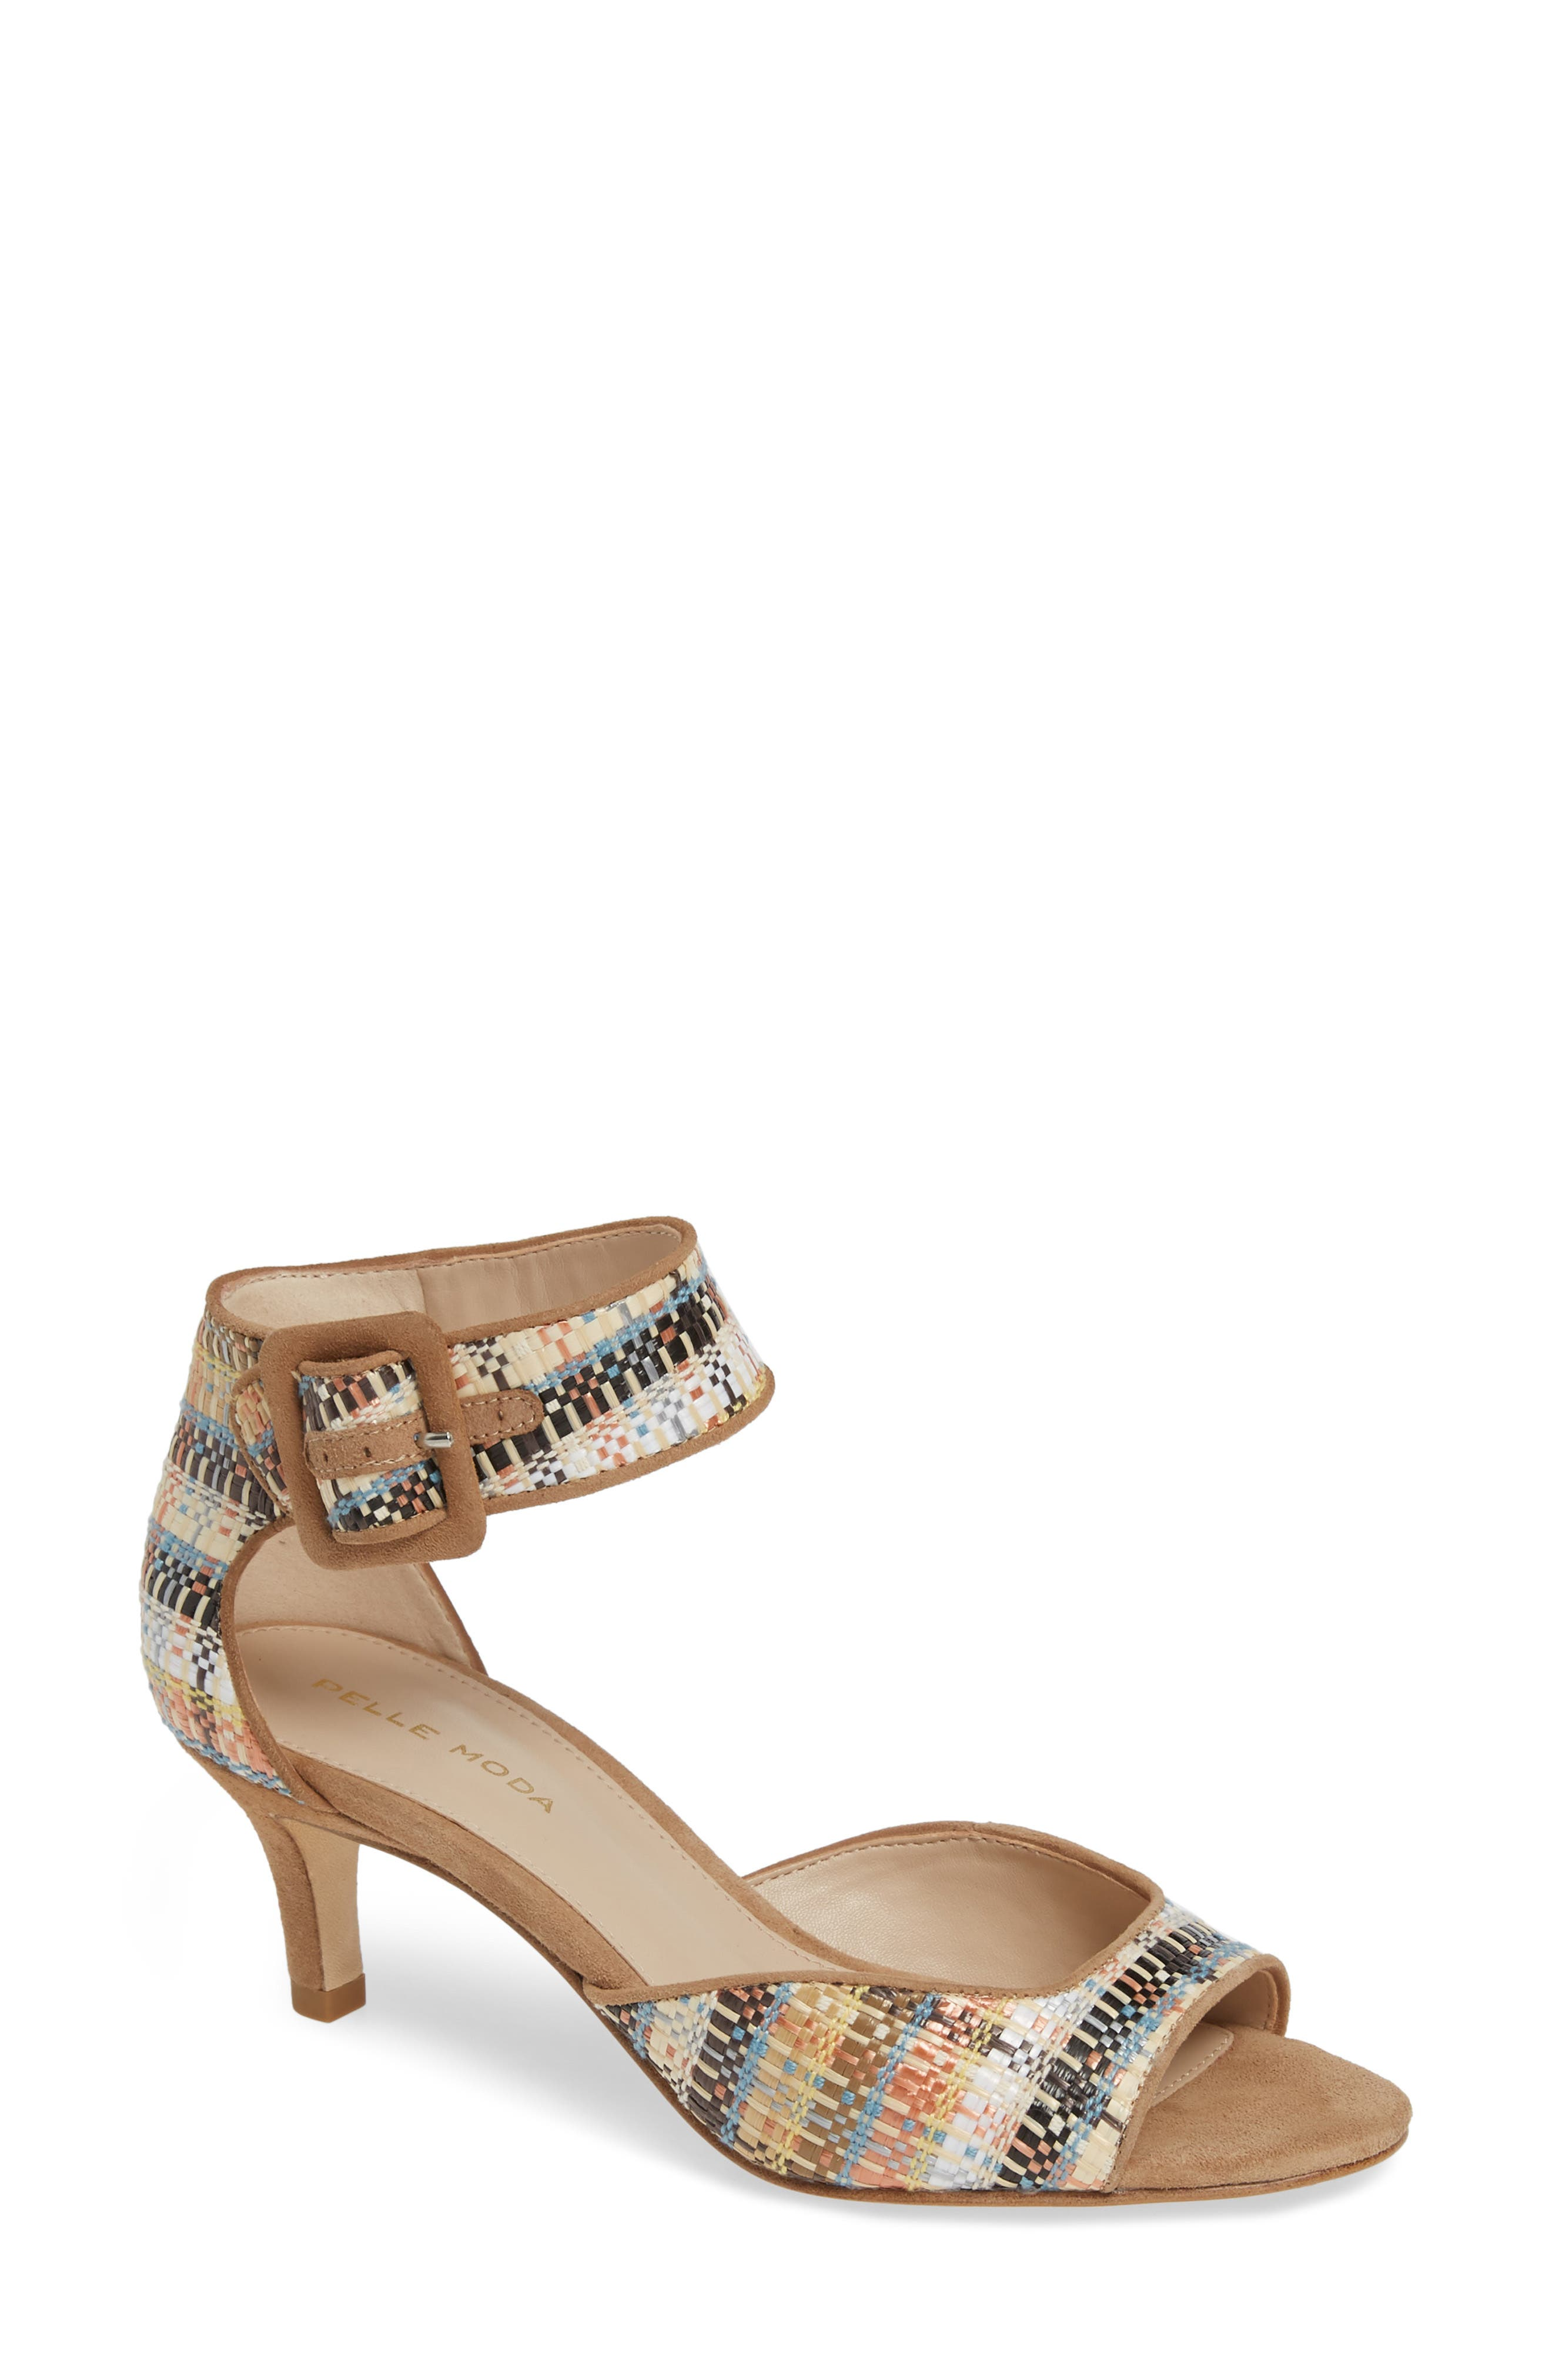 d47bf31abadf Women s Pelle Moda Sandals